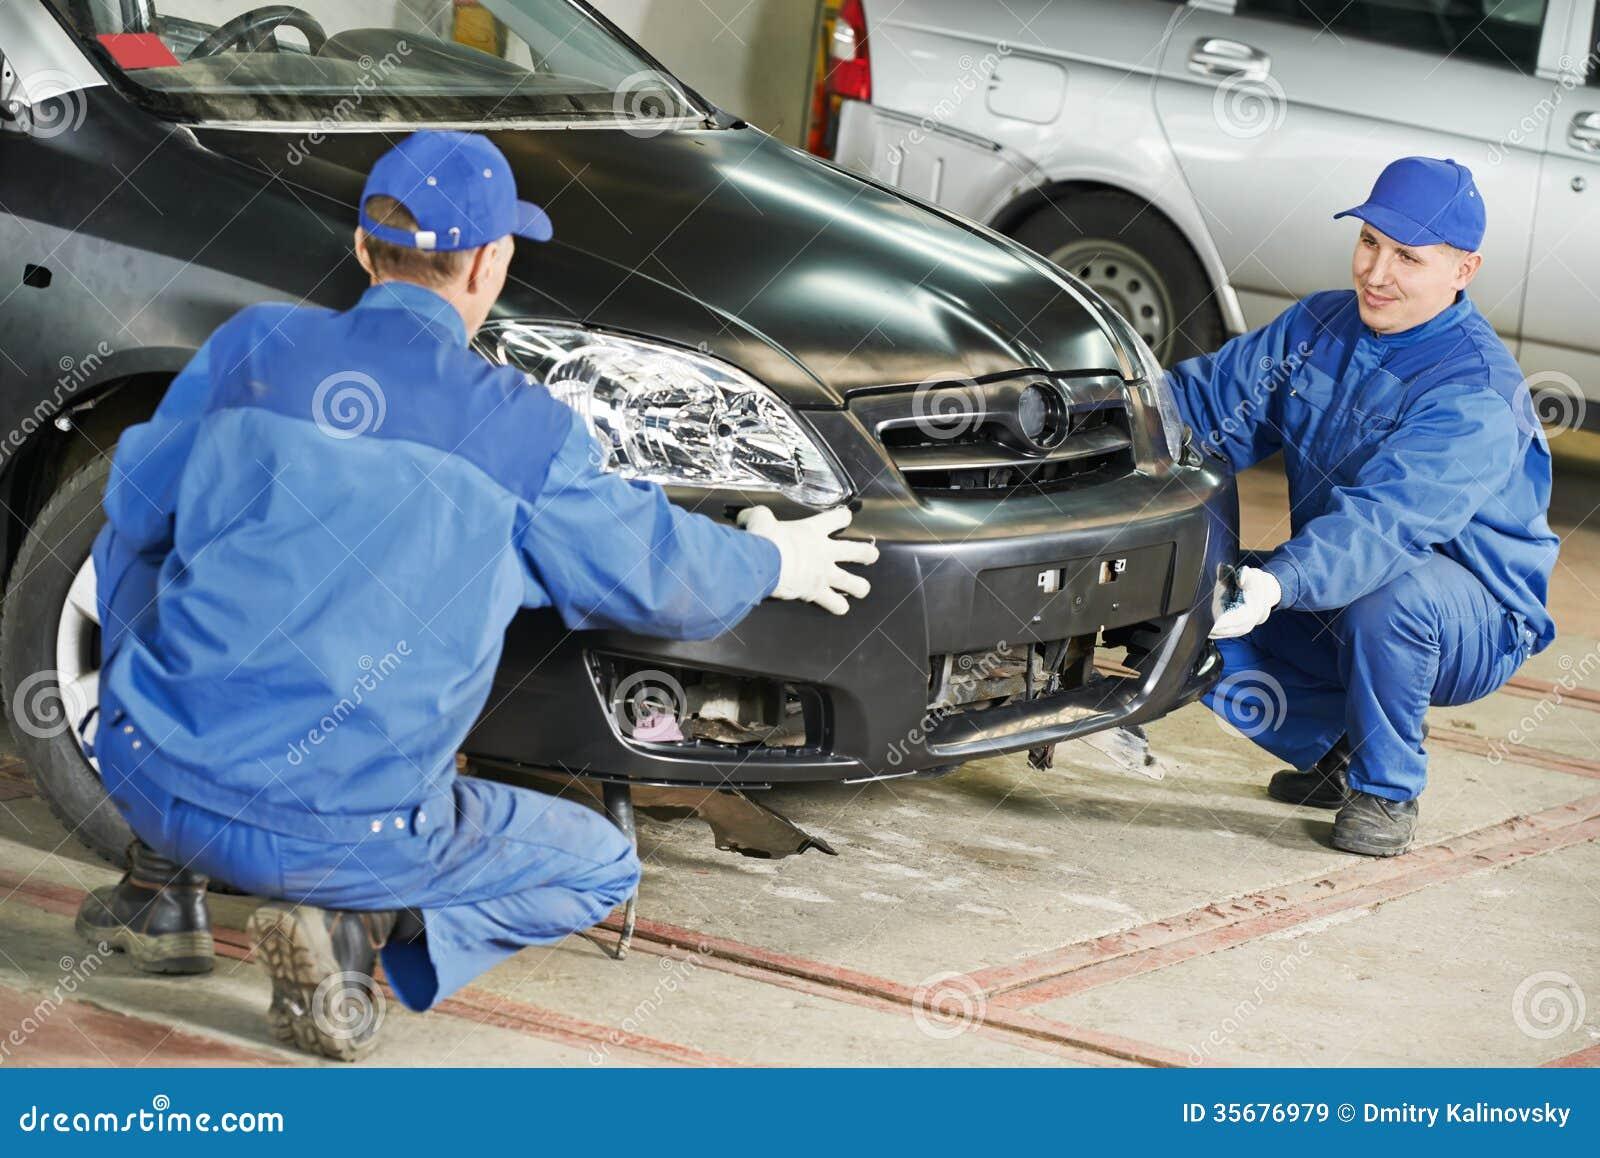 a 2 z auto repair venice - photo#15